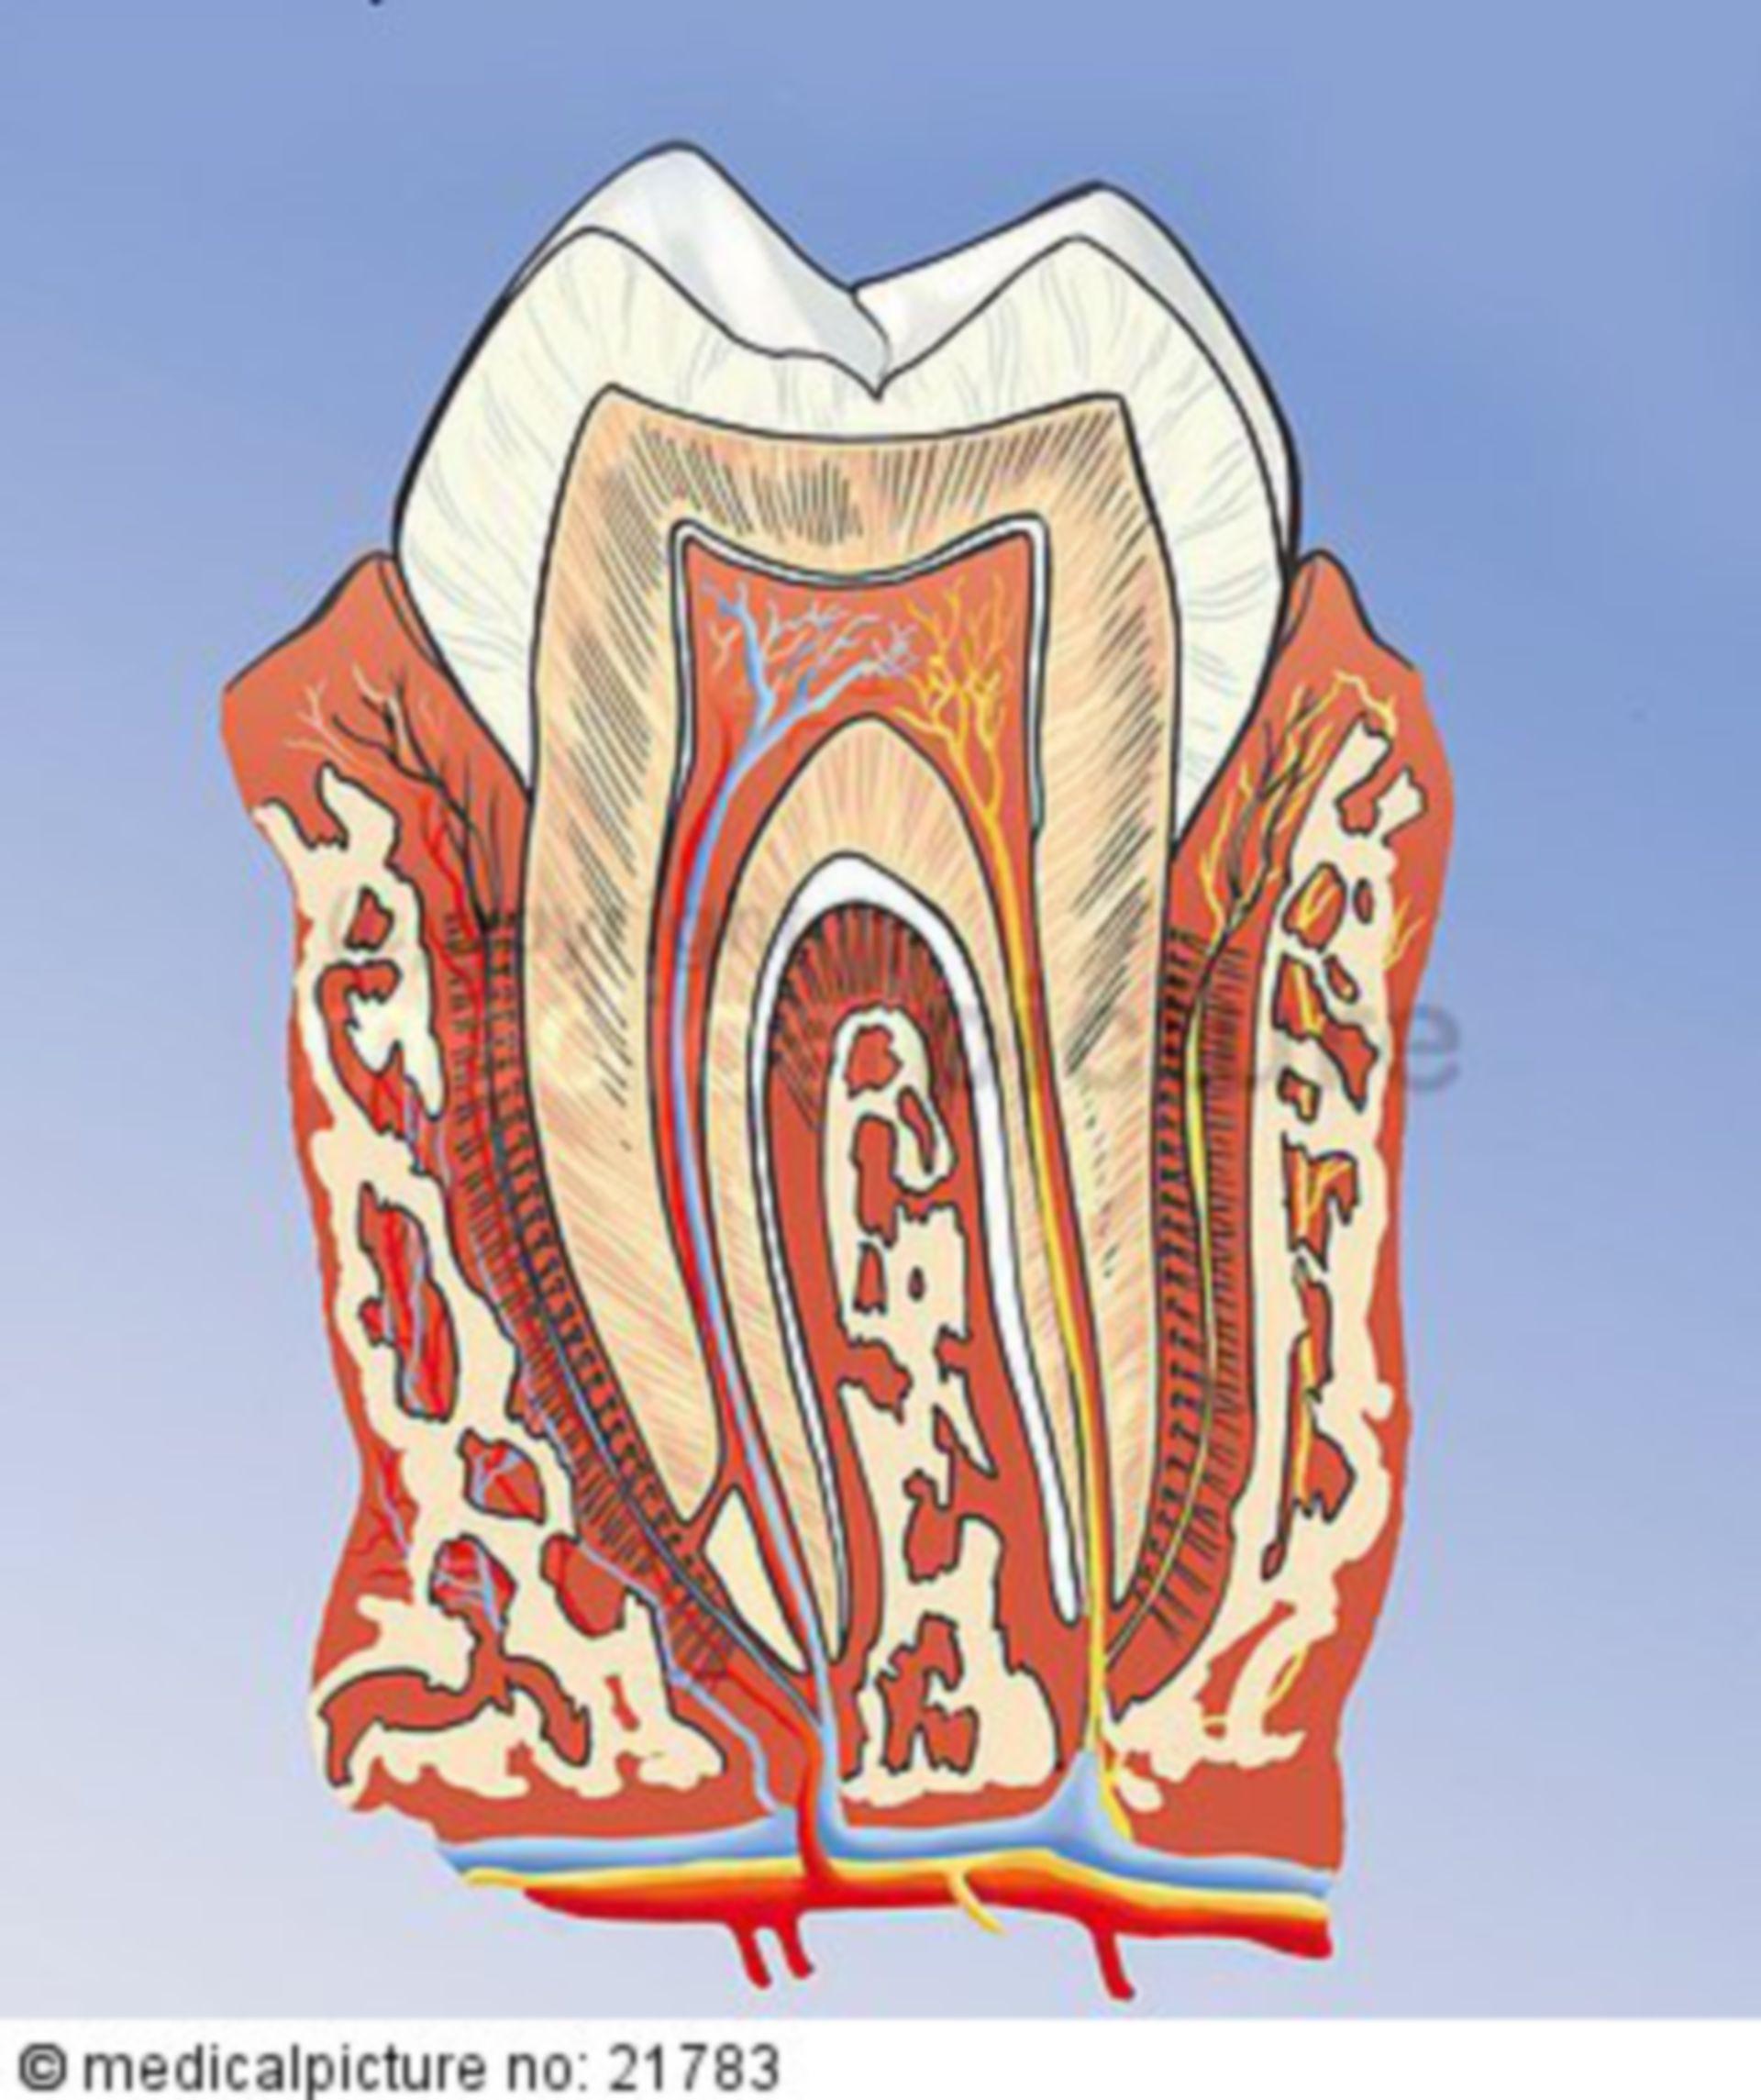 Tooth, longitudinal section